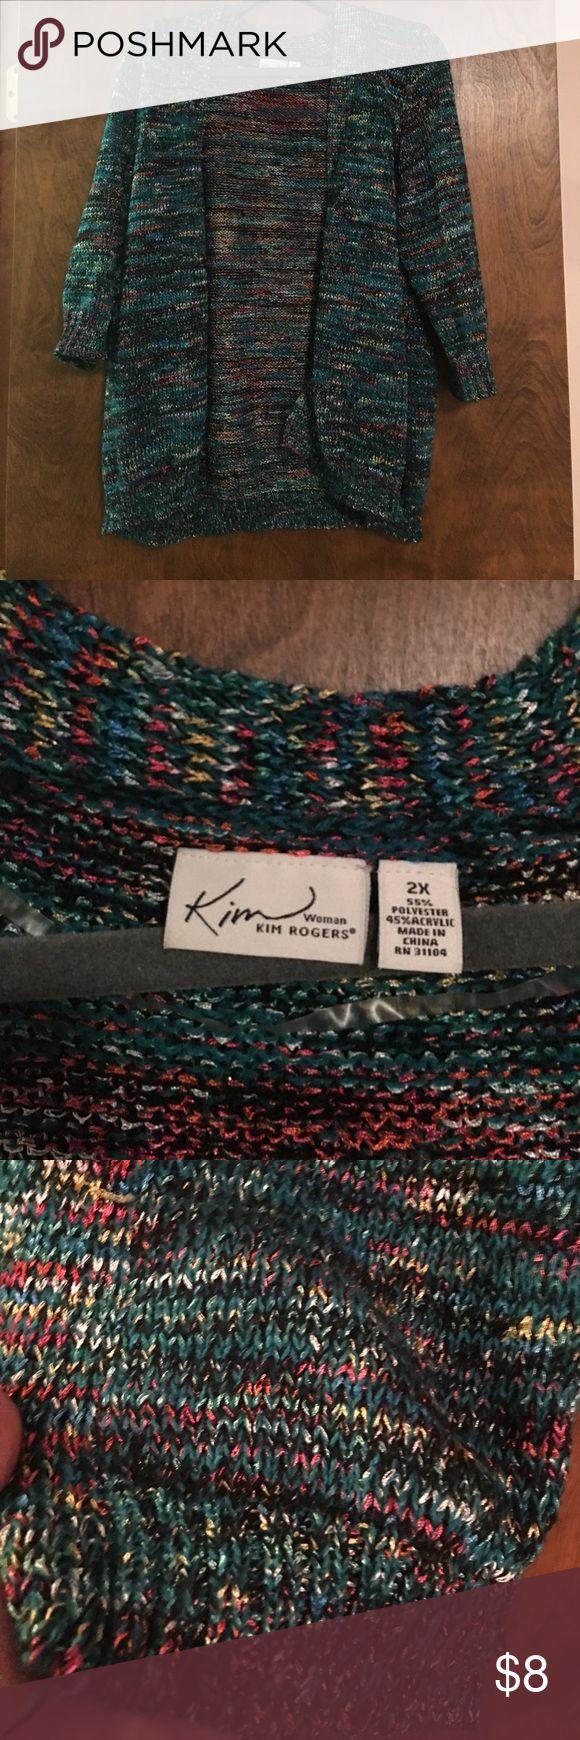 Multi color cardigan Kim Rogers multi Color cardigan worn one time Kim Rogers Sweaters Cardigans